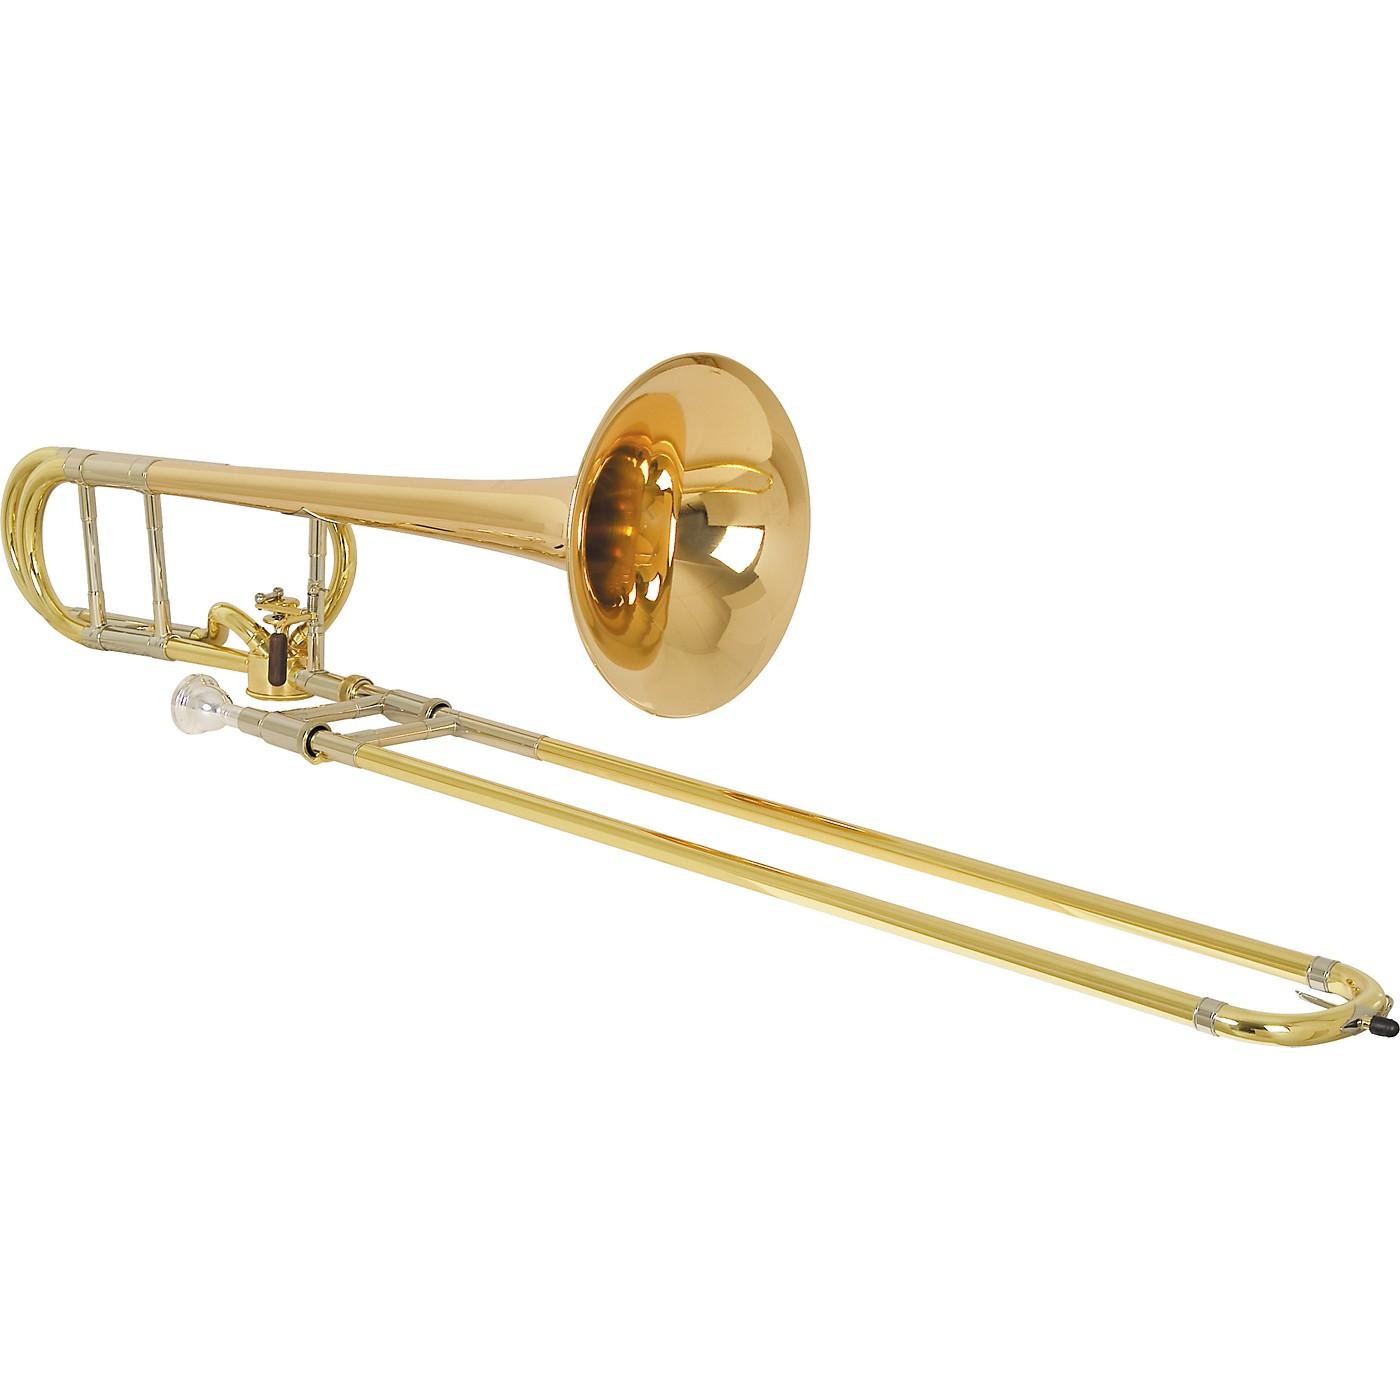 Bach 42A Stradivarius Trombone with Hagmann Valve thumbnail